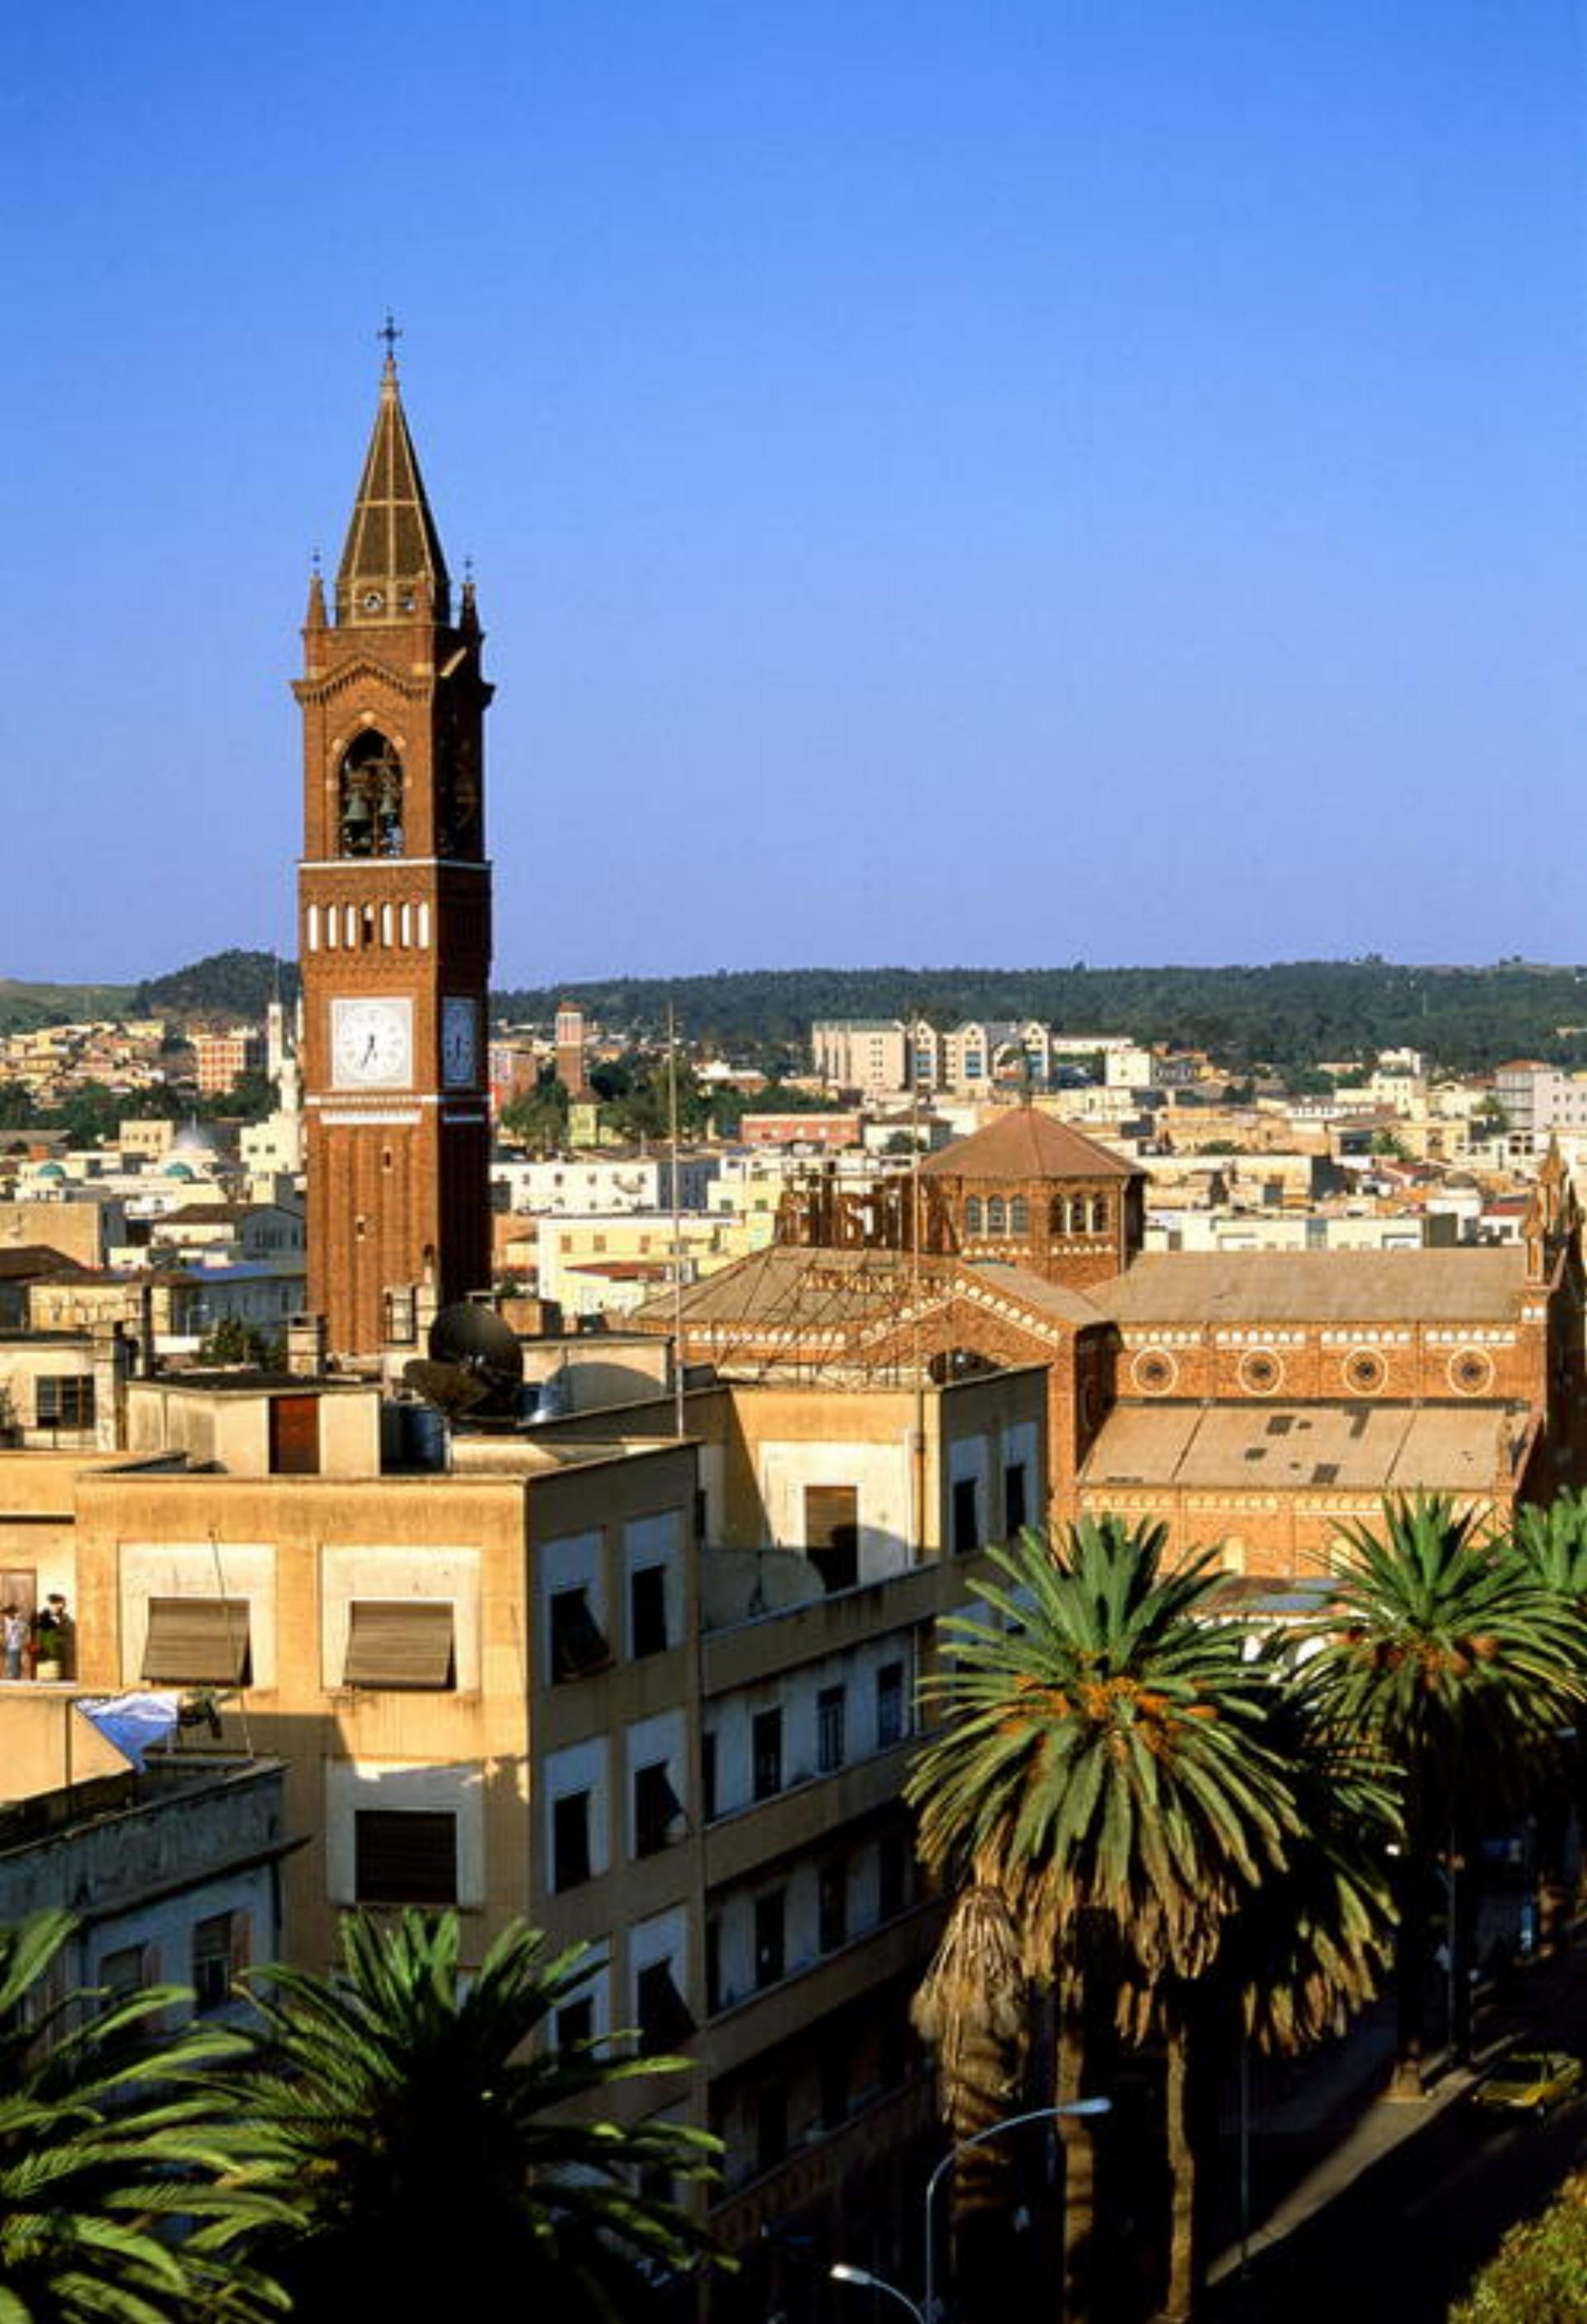 Asmara, a UNESCO World Heritage modernist city in Africa